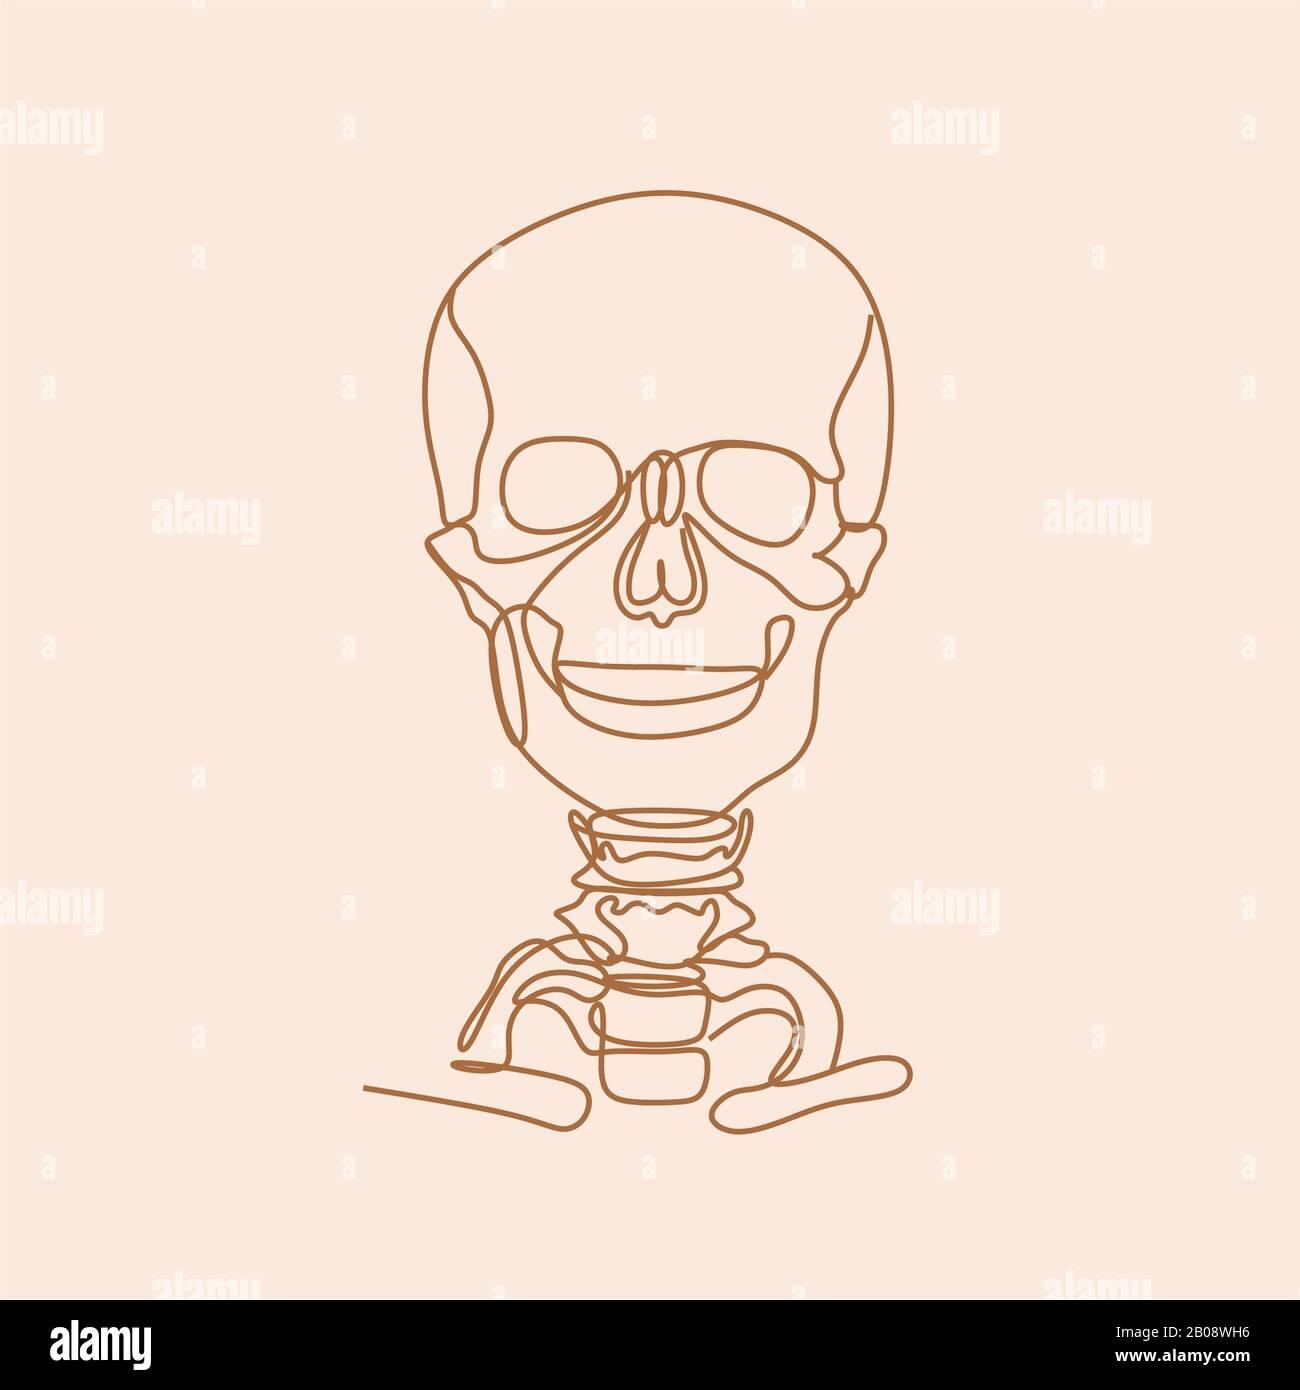 Skull Line Illustration Line Art People Body Minimalist Medical Print Stock Photo Alamy